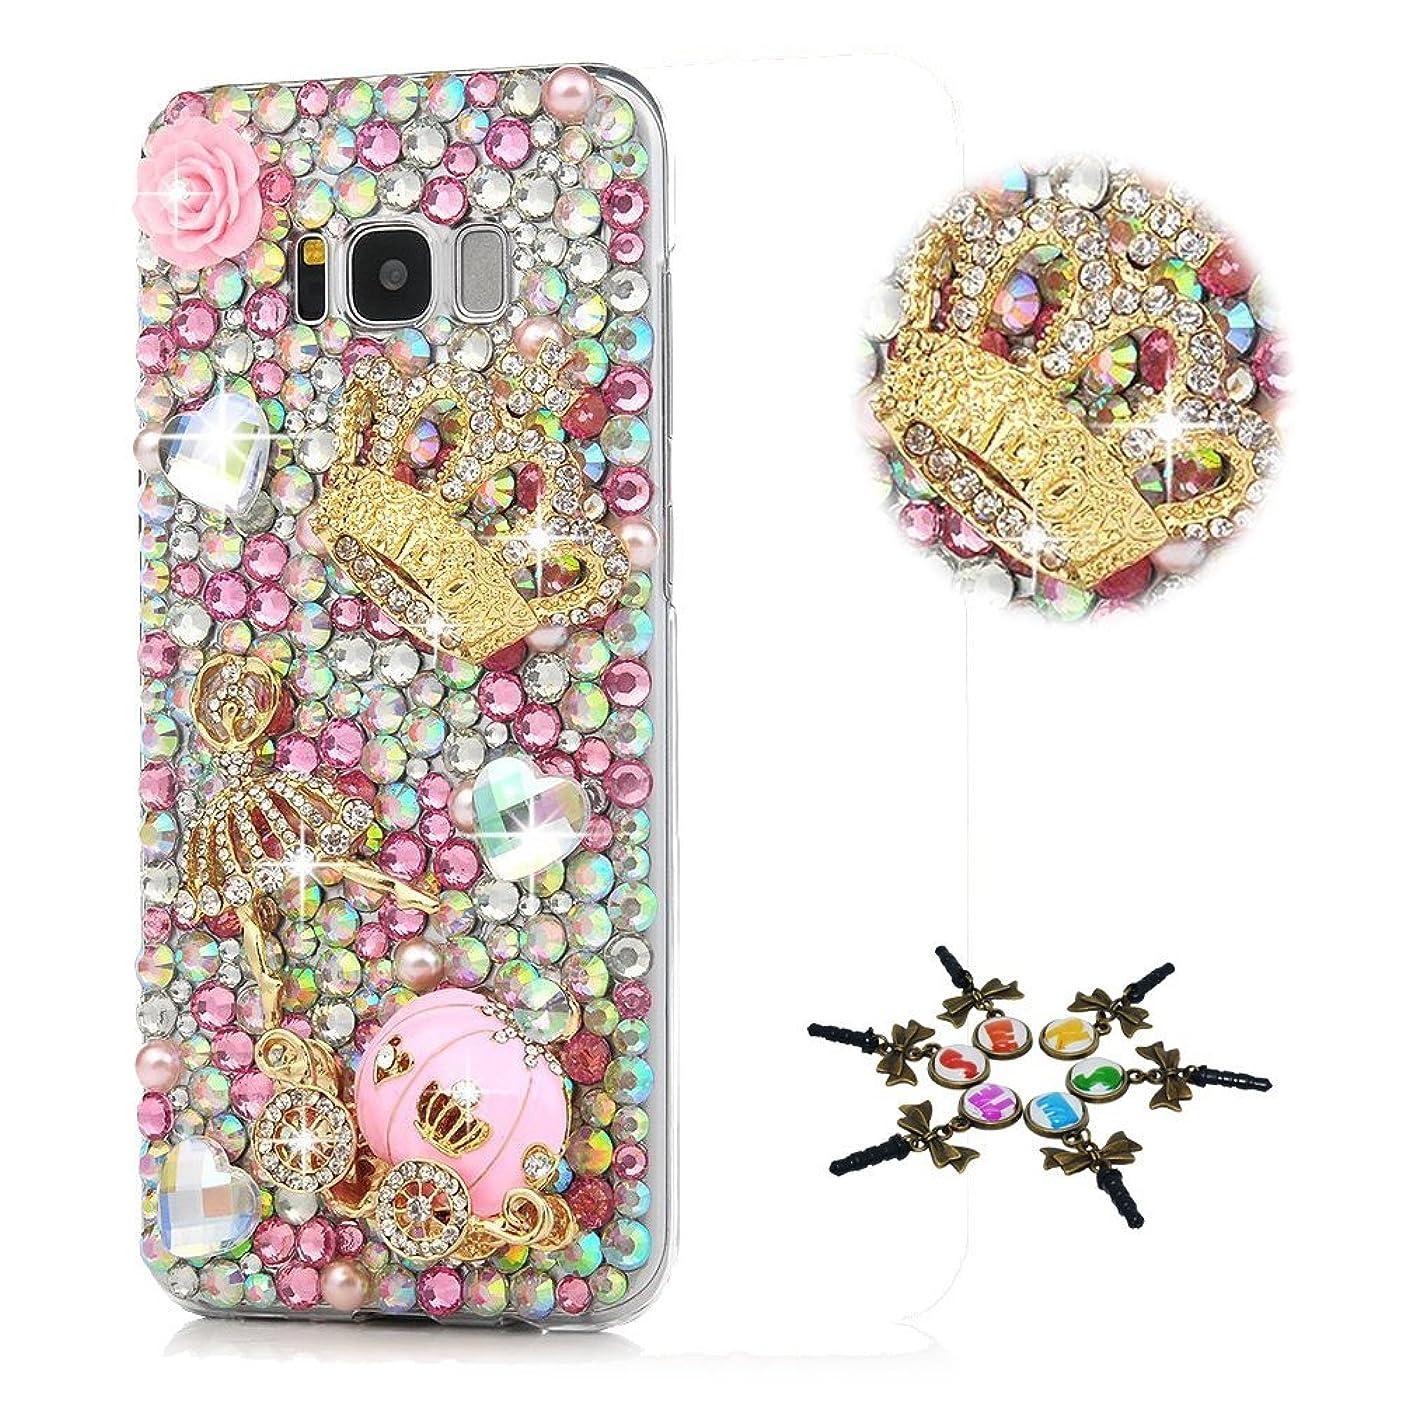 STENES Galaxy J7 (2018) Case - Stylish - 100+ Bling Crystal - 3D Handmade Crown Dance Girl Pumkpin Car Design Bling Cover Case for Samsung Galaxy J7 2018/Galaxy J7 Refine/Galaxy J7 Star - Pink